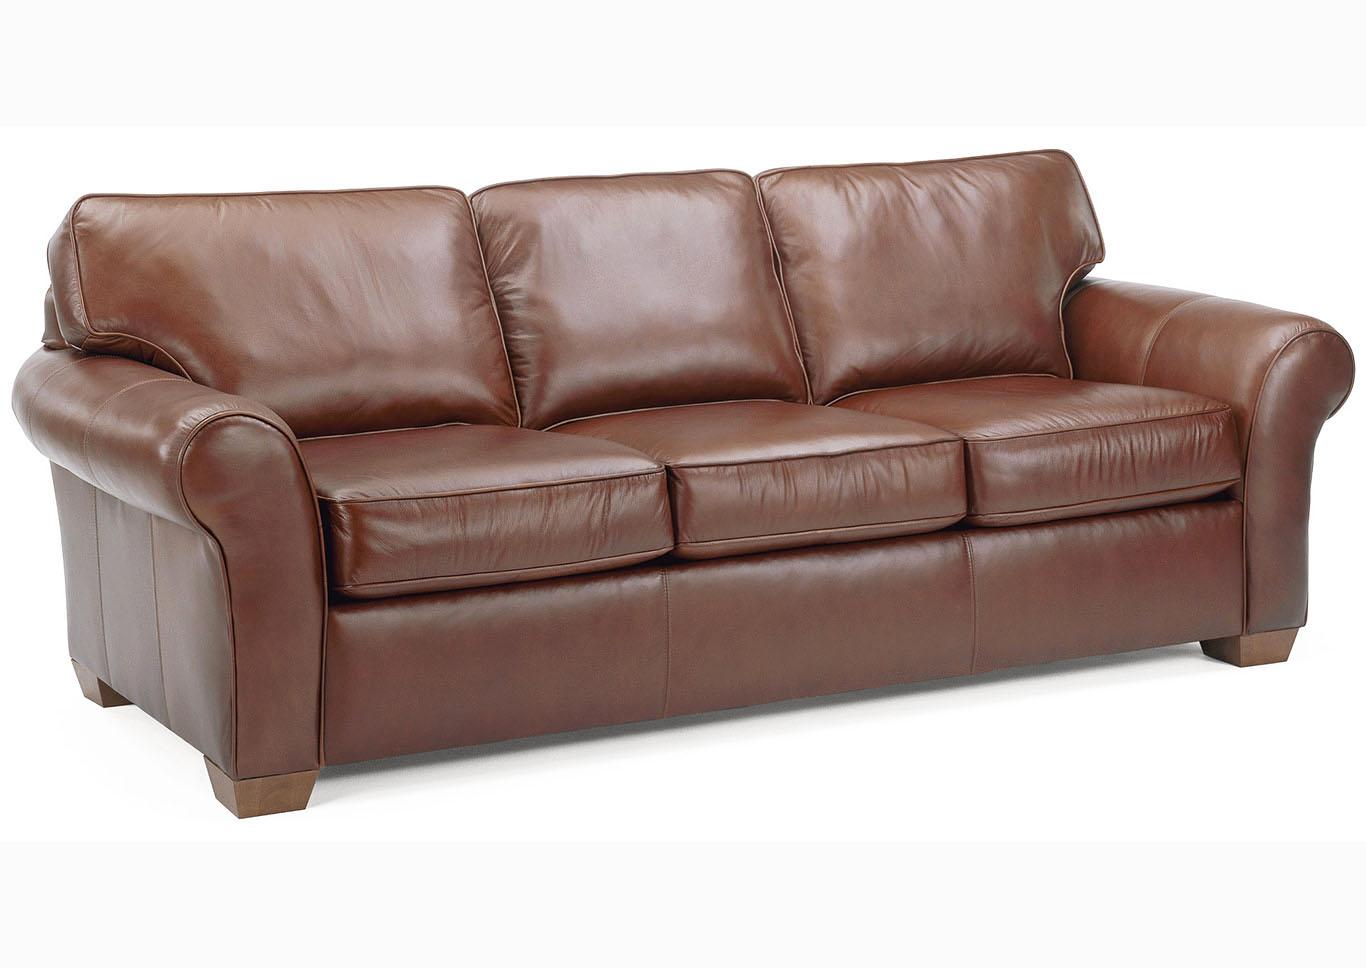 Incroyable Vail Leather Three Cushion Sofa,Flexsteel